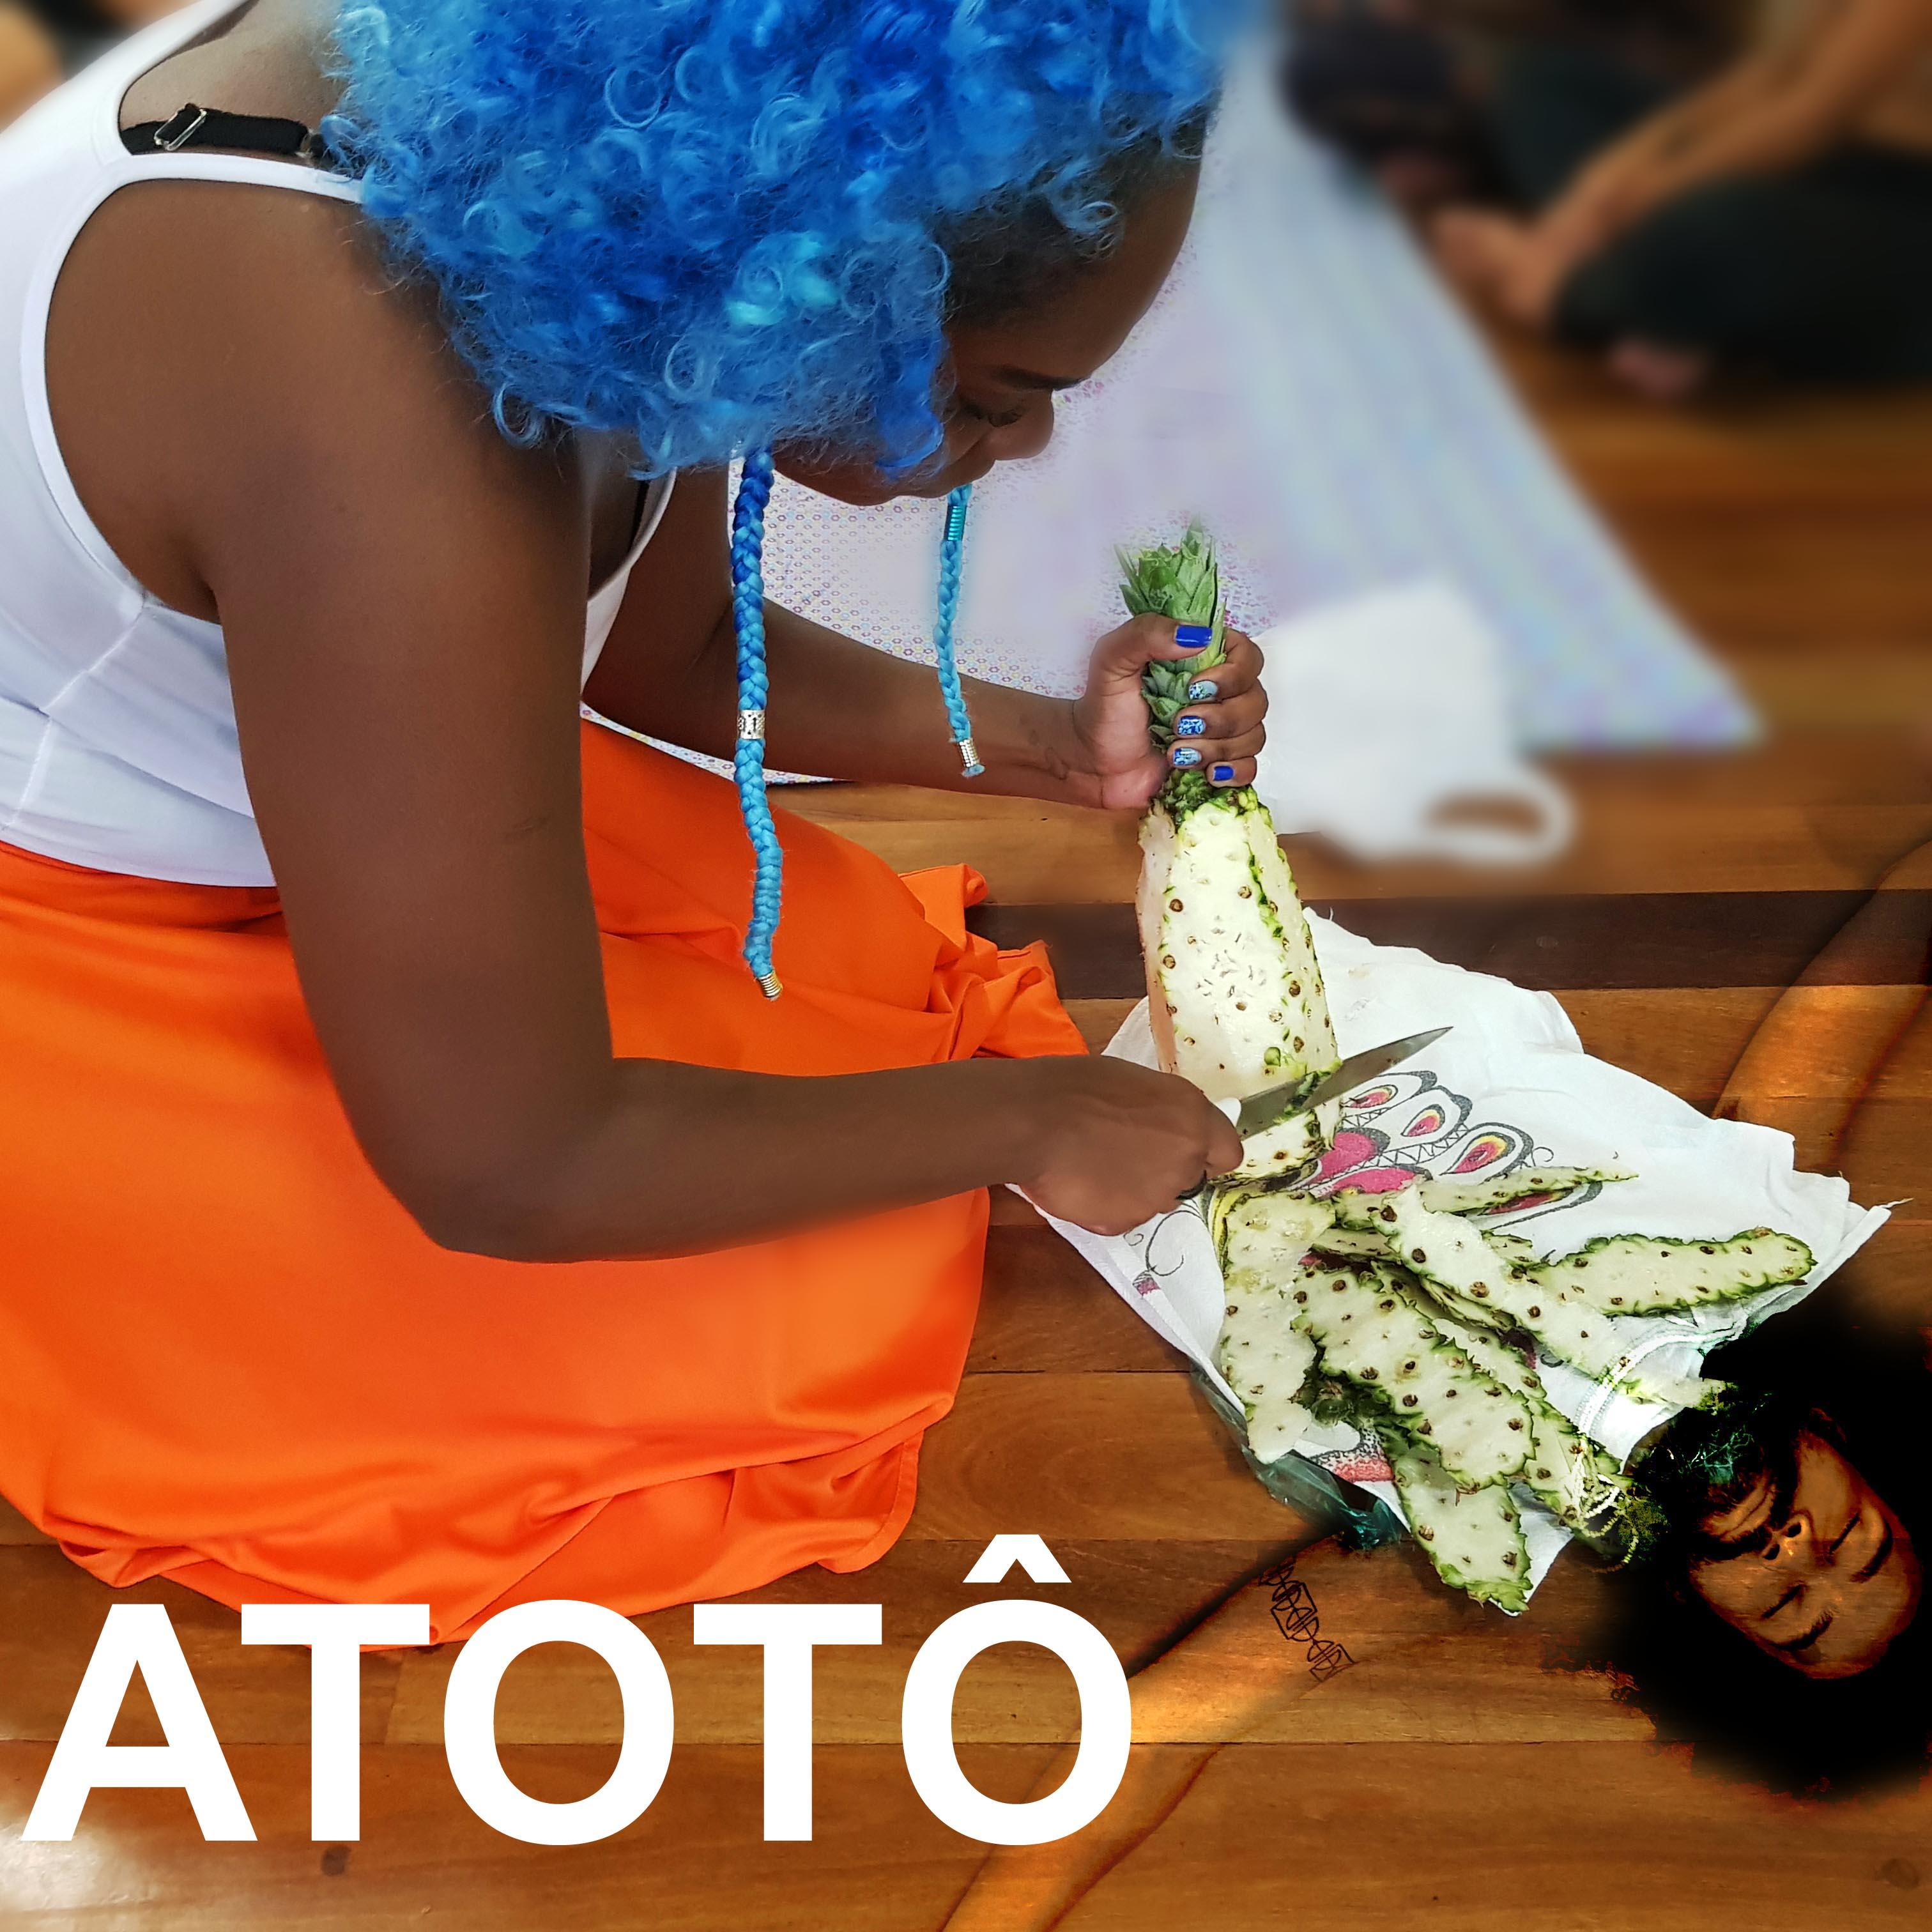 Dia 8 - Atoto